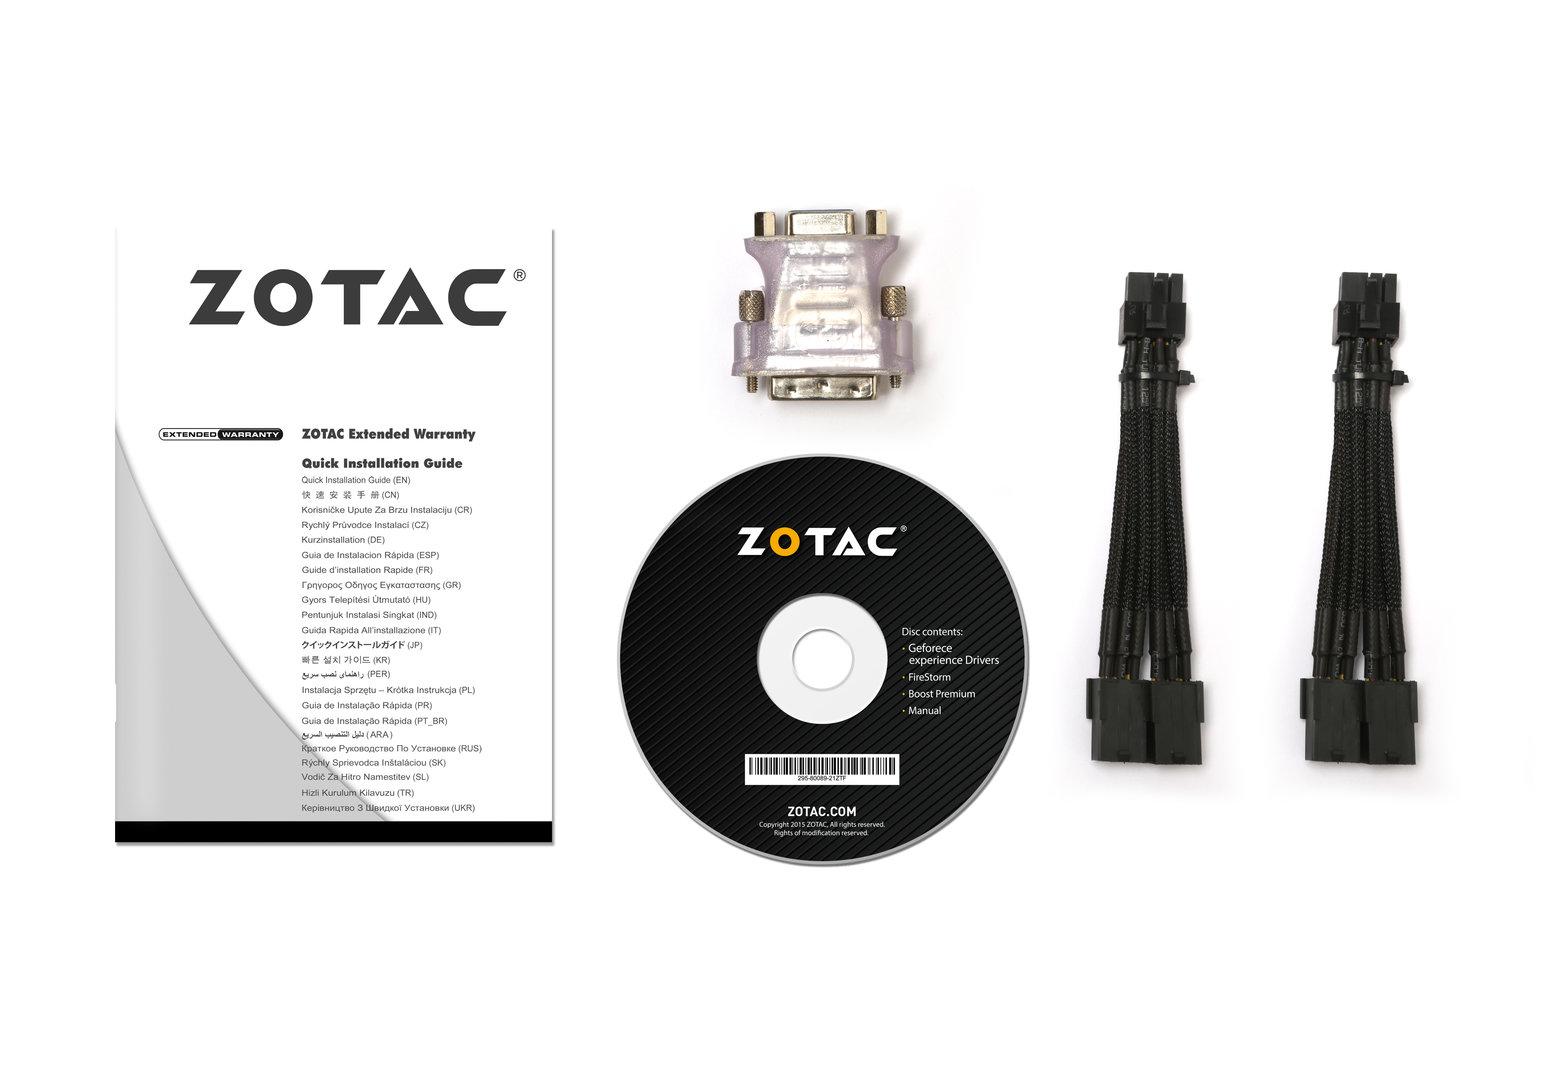 Zotac GTX 1080 AMP! Extreme